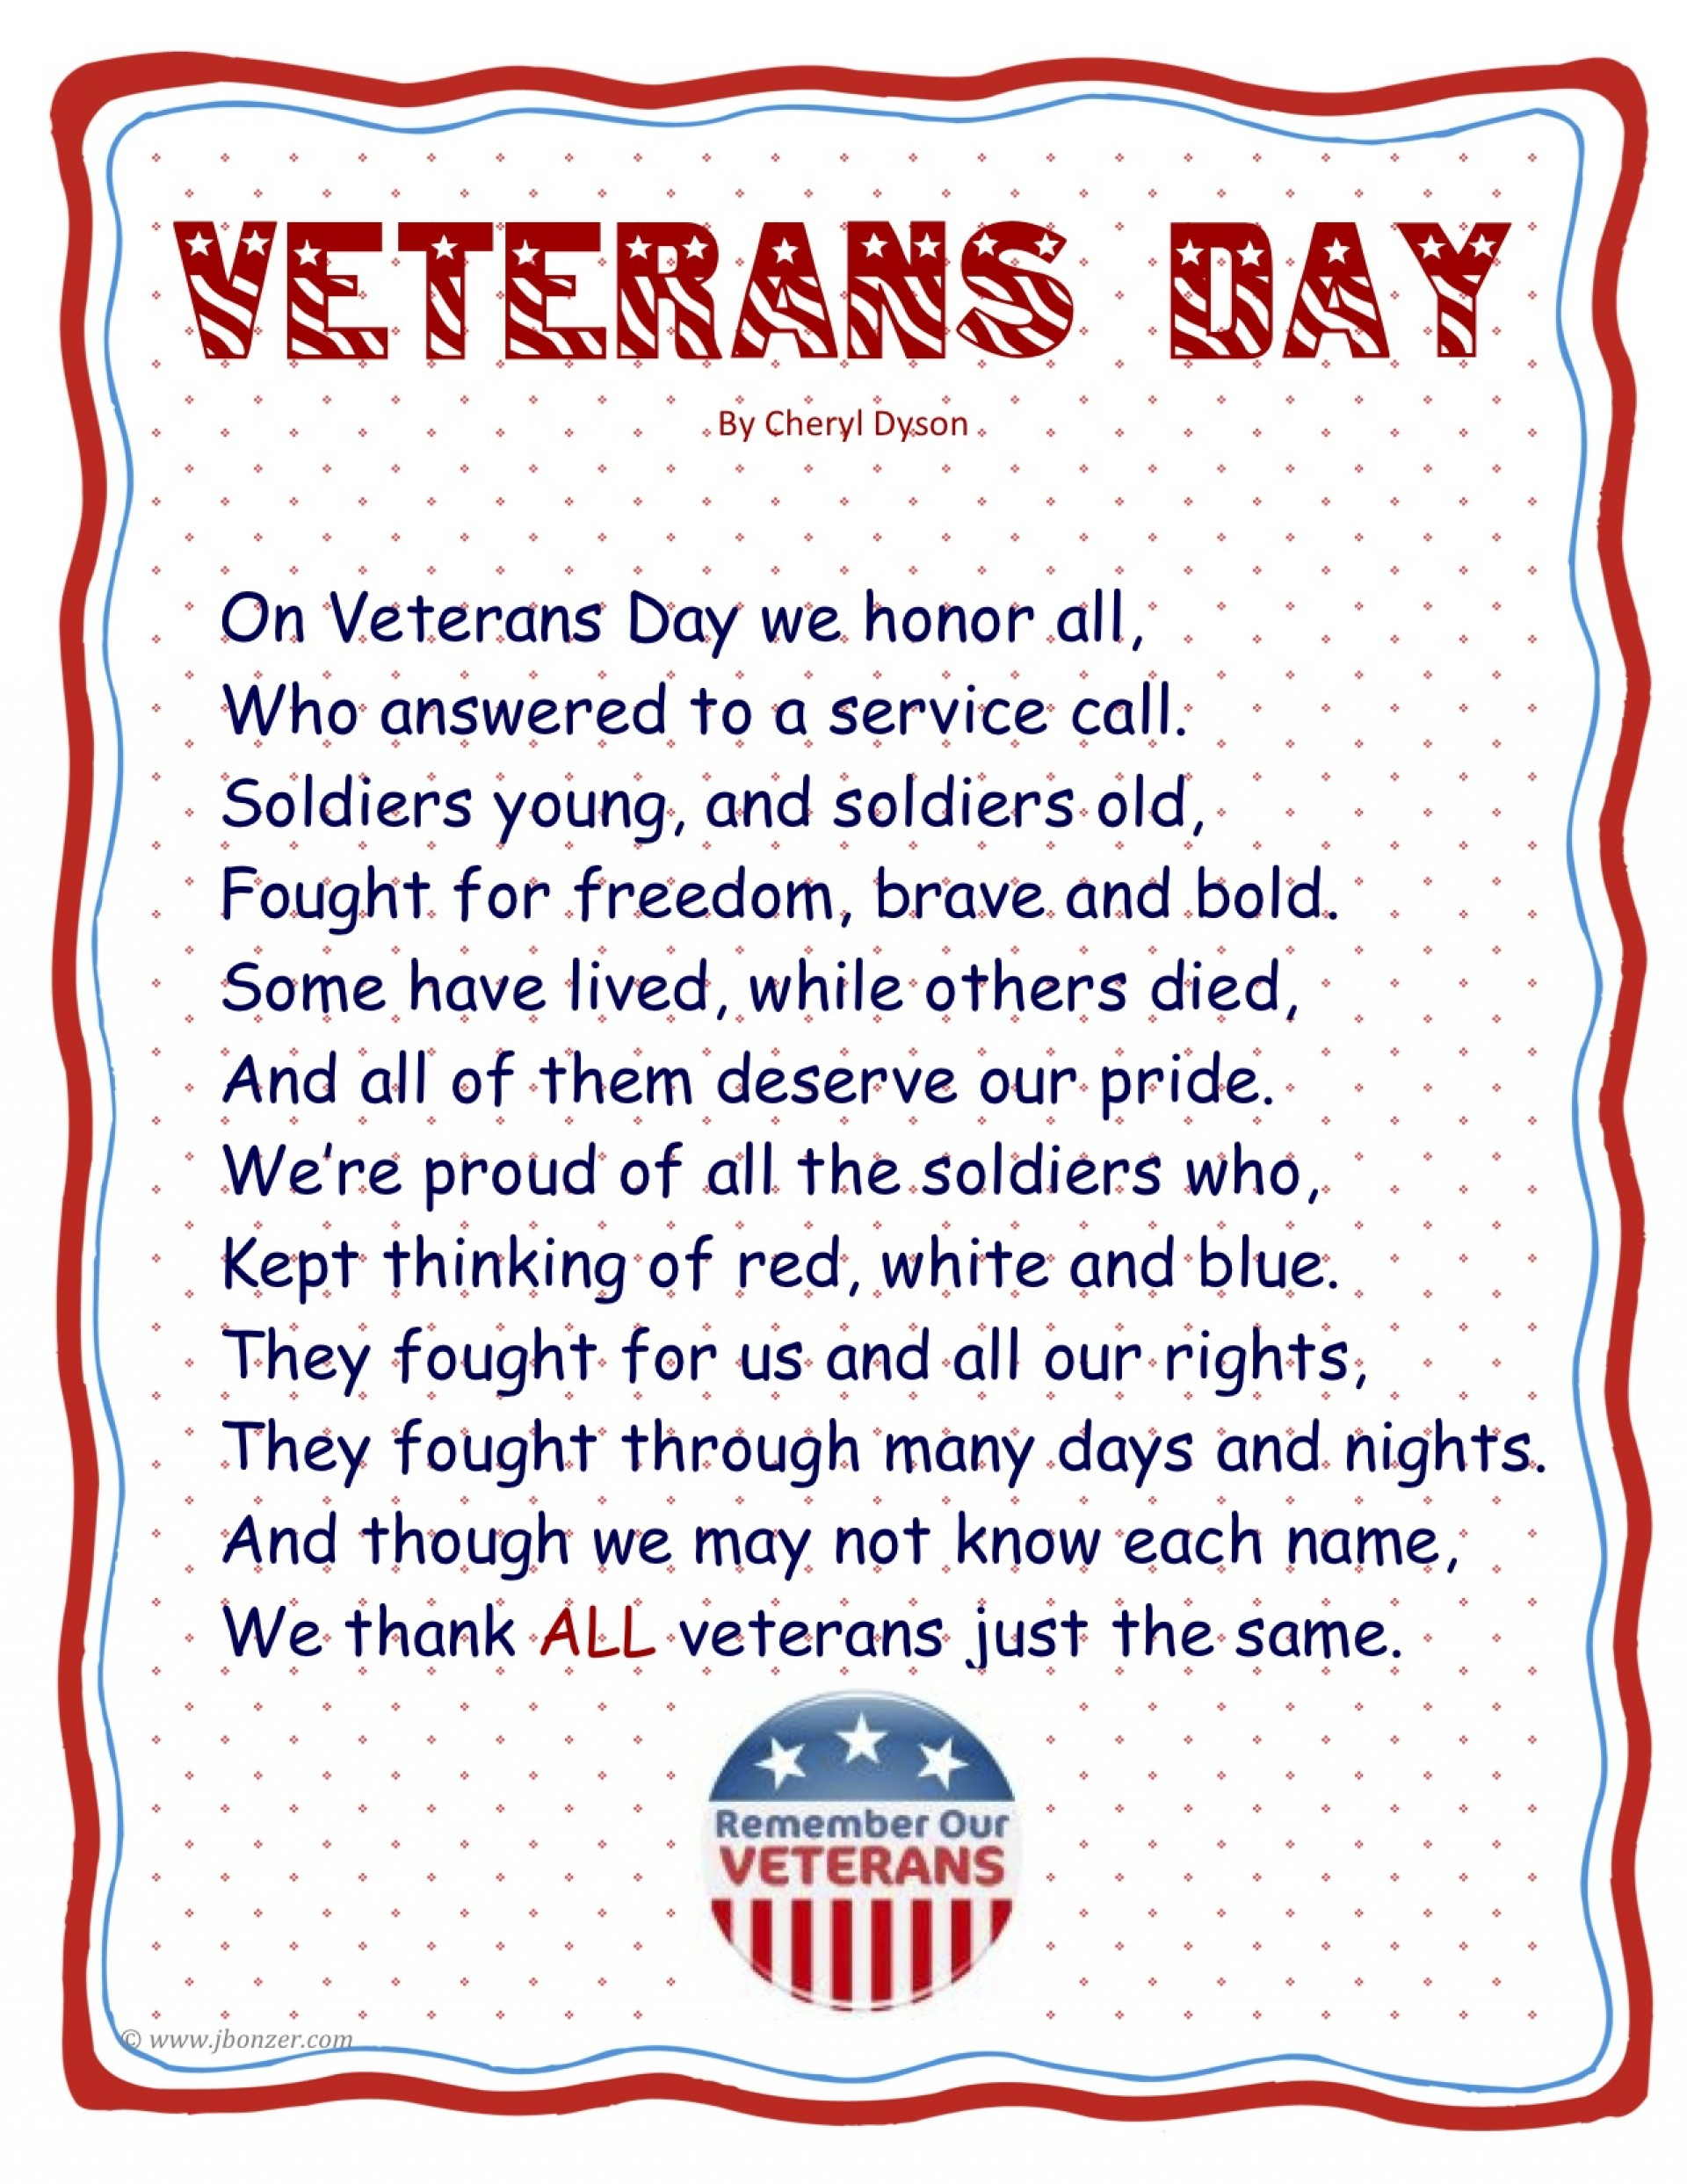 019 Essay Example Veteransdaypoembyjudybonzer3 Tuck Mba Marvelous Essays Sample Tips 2018 1920